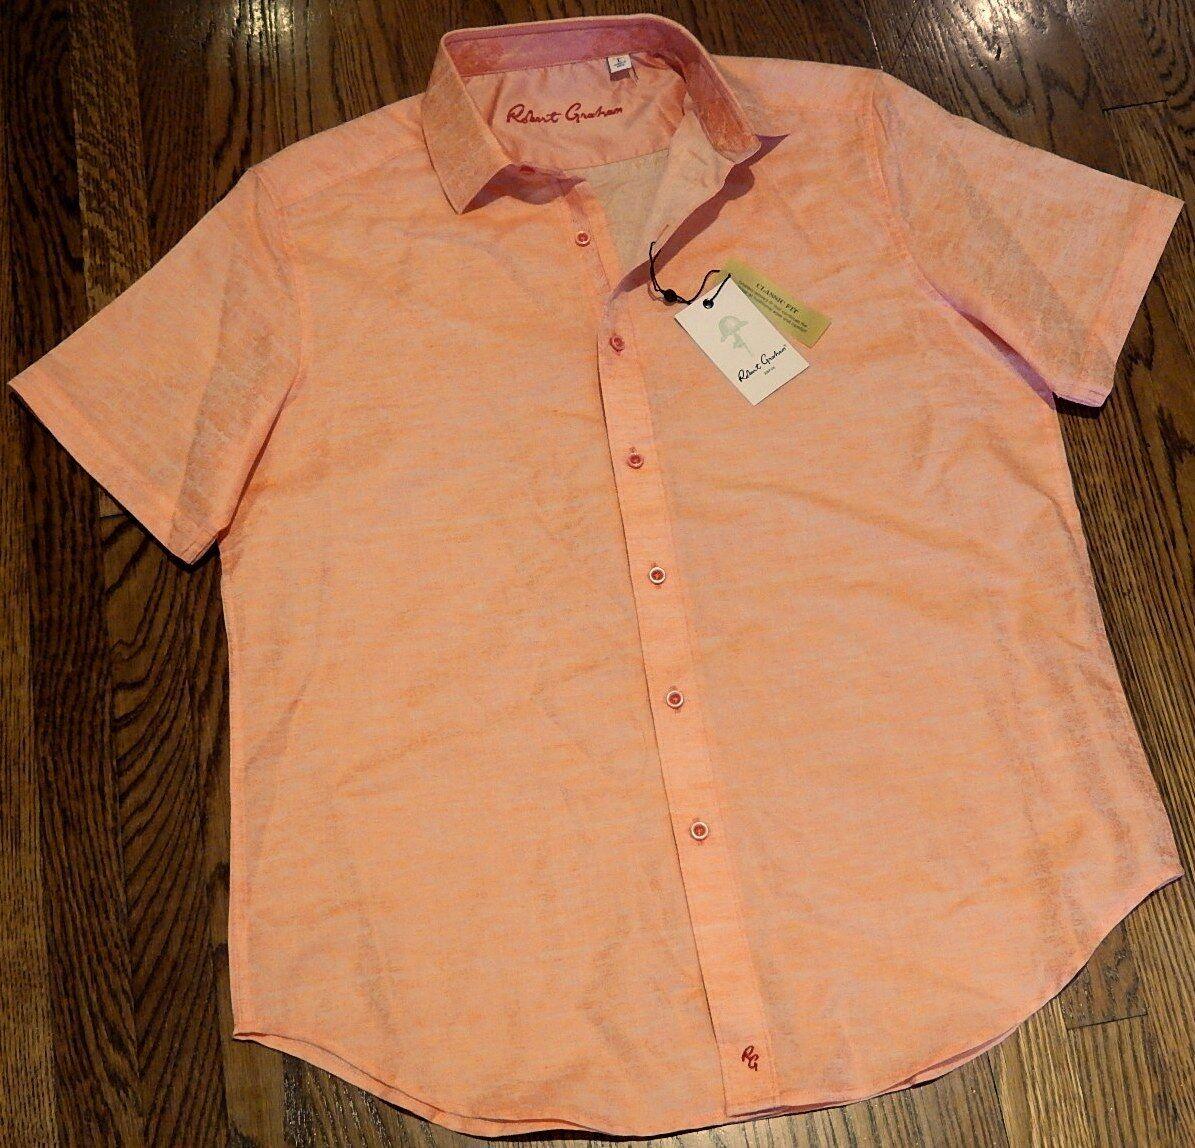 ROBERT GRAHAM MENS AUTHENTIC NEW orange DRESS SHIRT Size XL (EXTRA LARGE), NWT